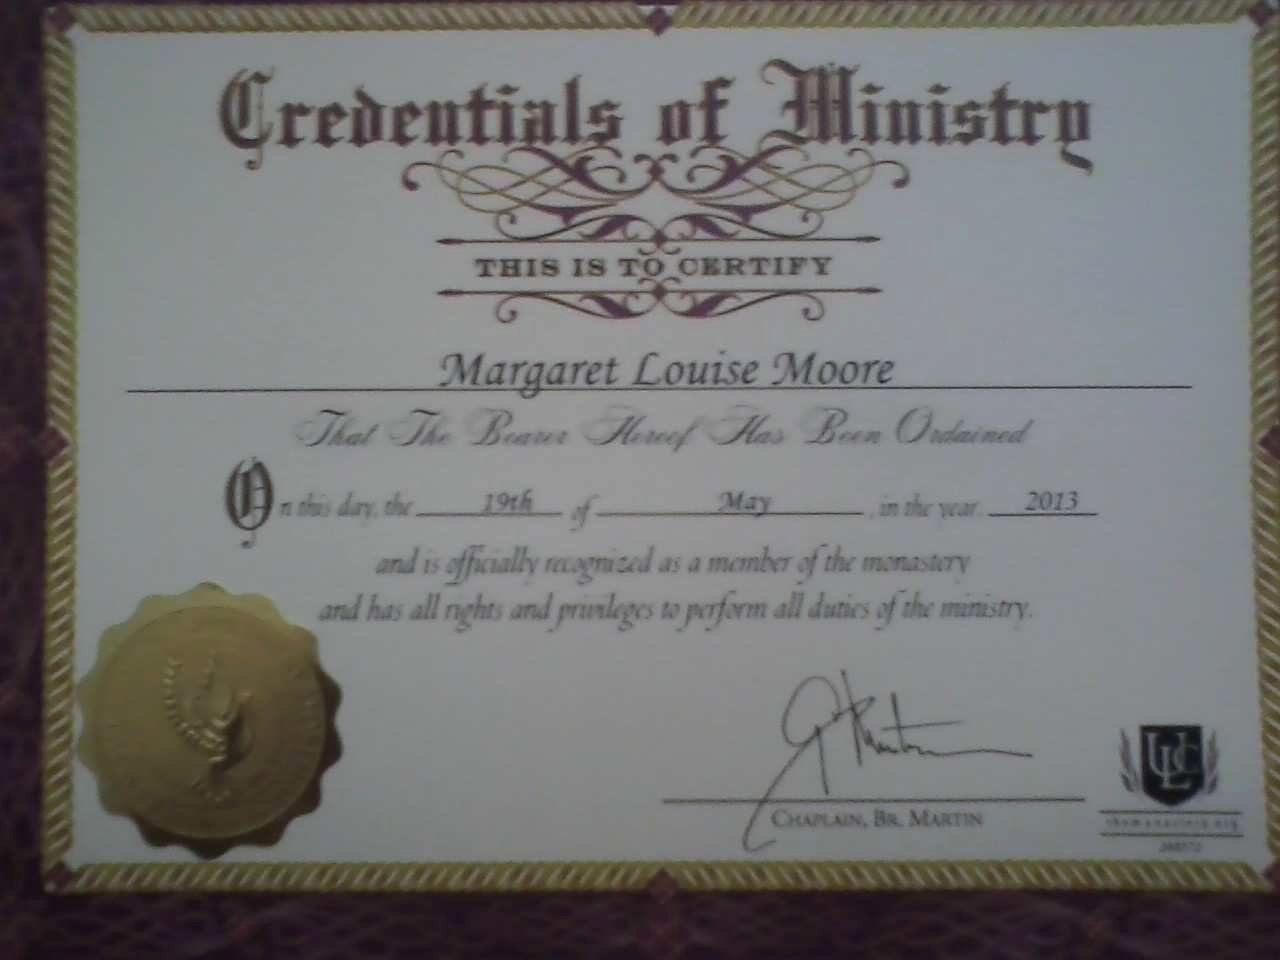 Pastor ordination Certificate Template Unique Minister ordination Certificate Useful Deacon ordination